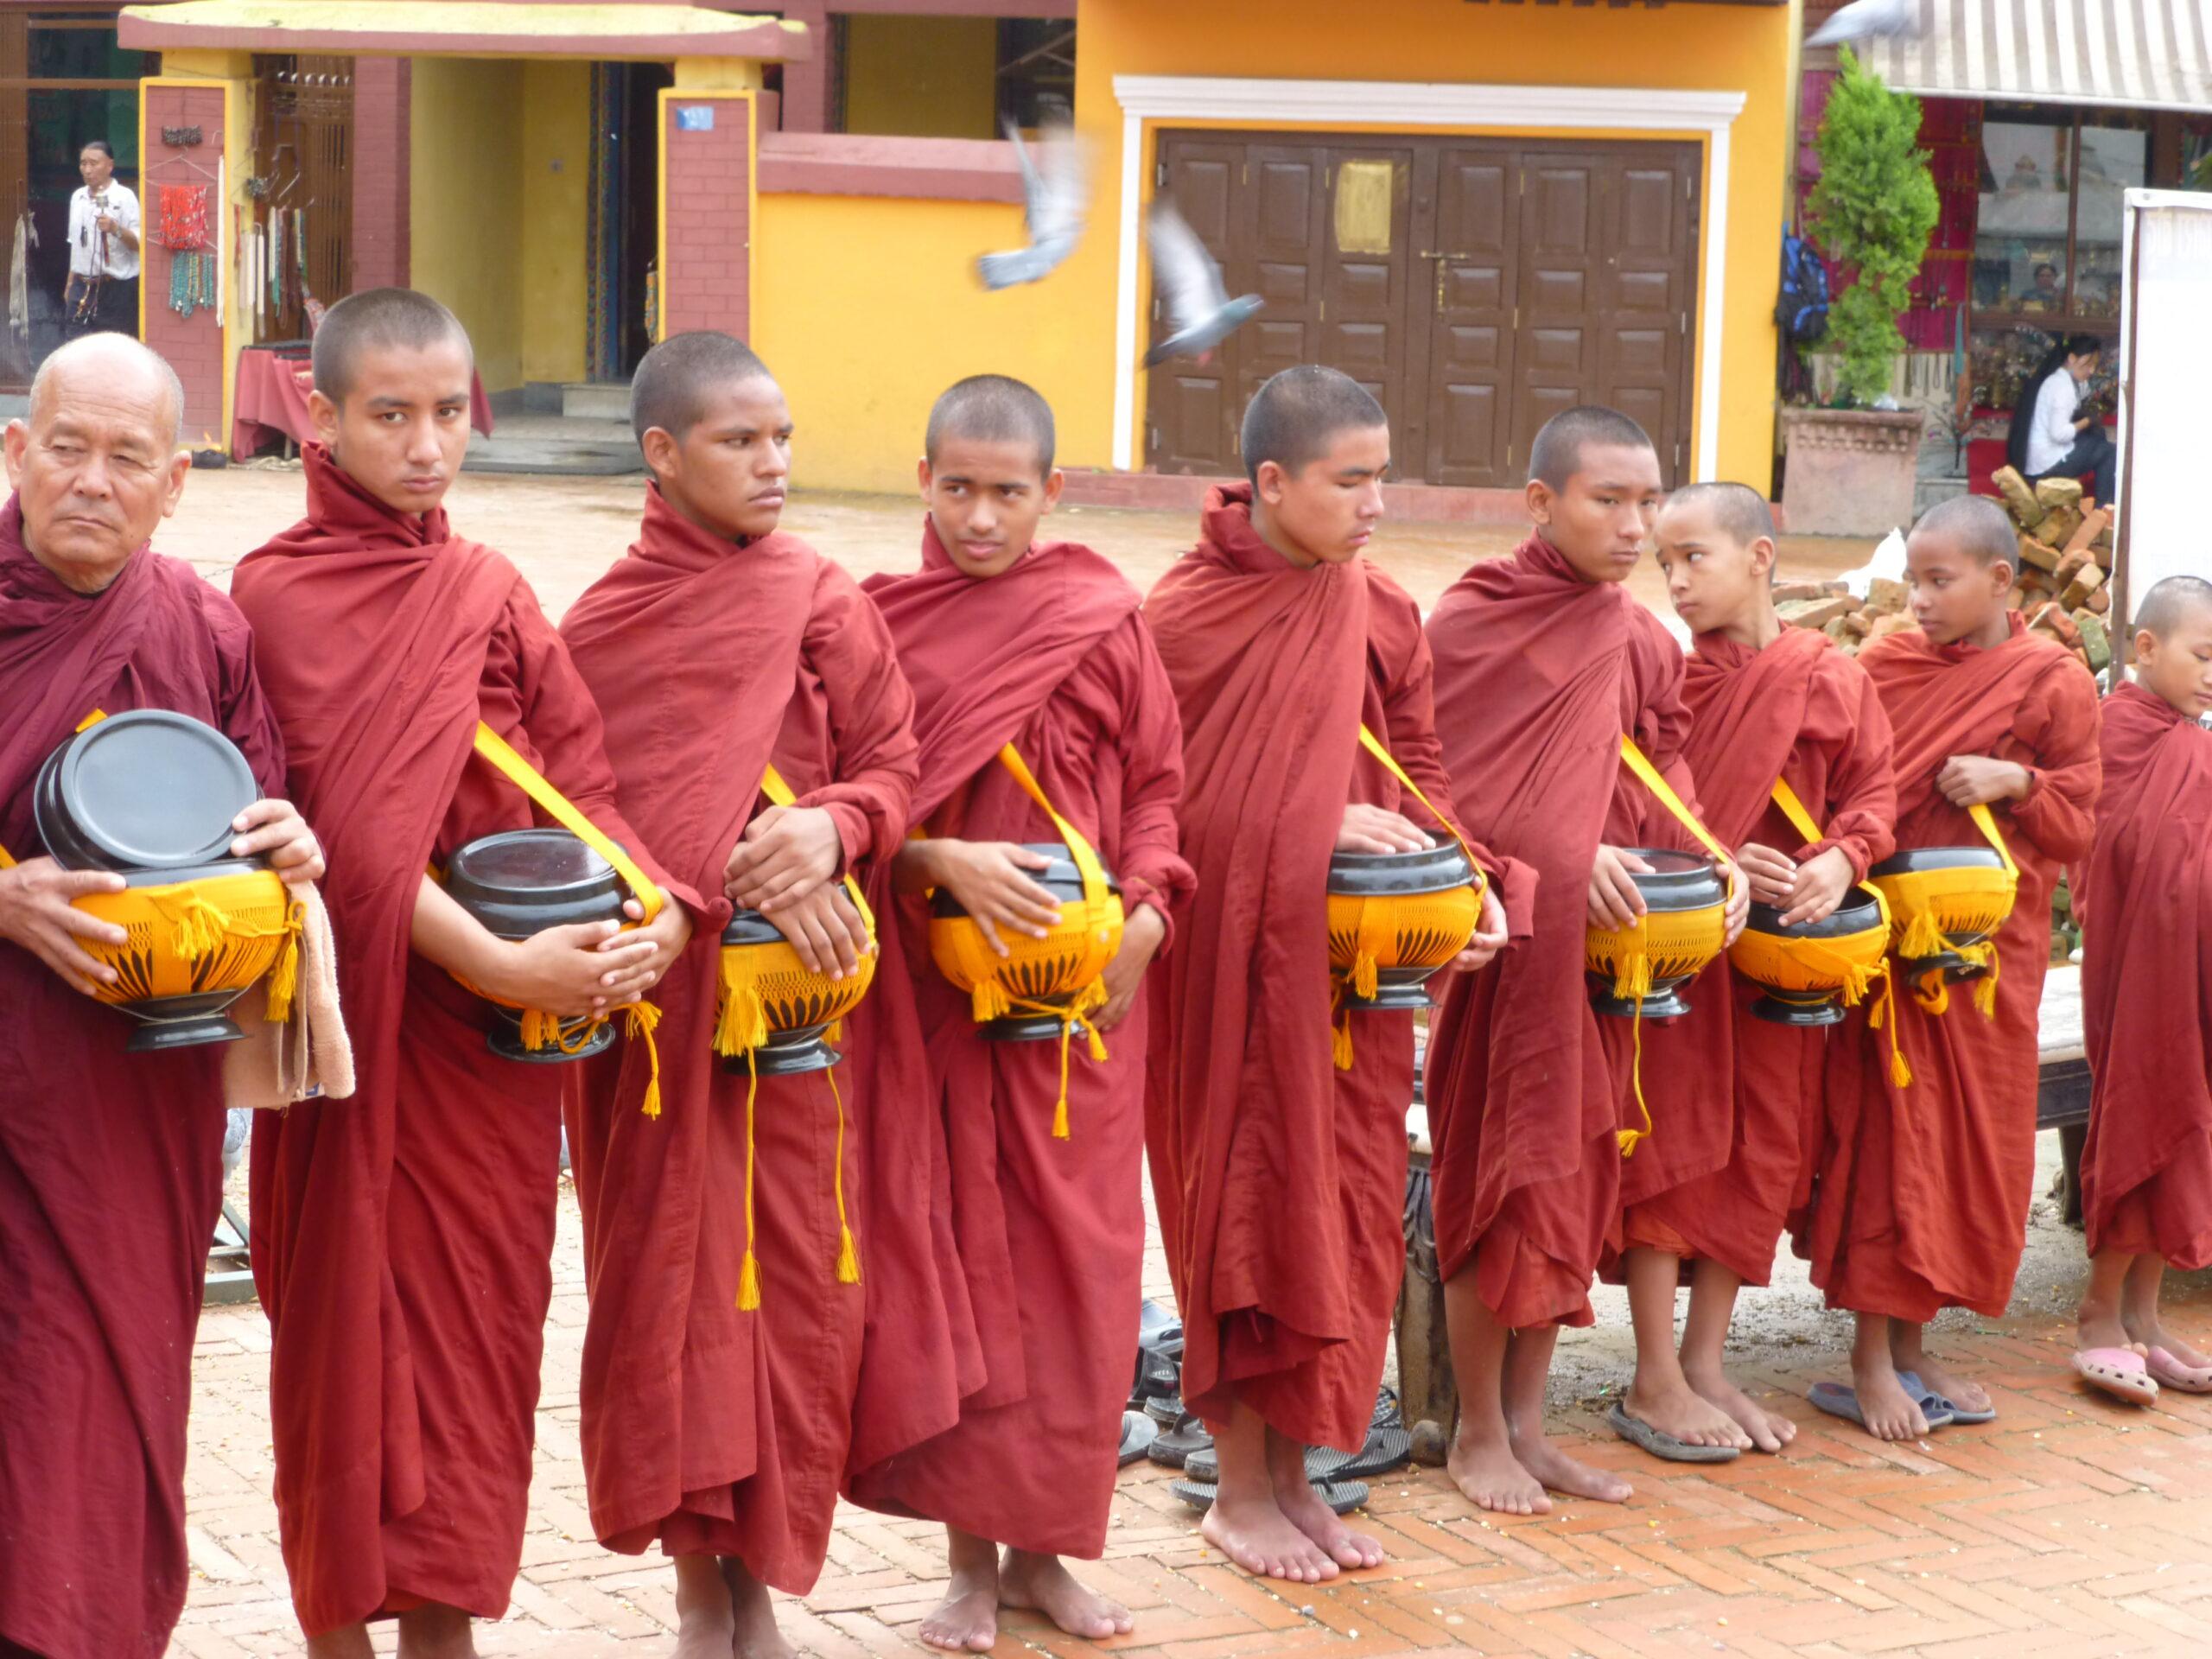 Monniken Nepal